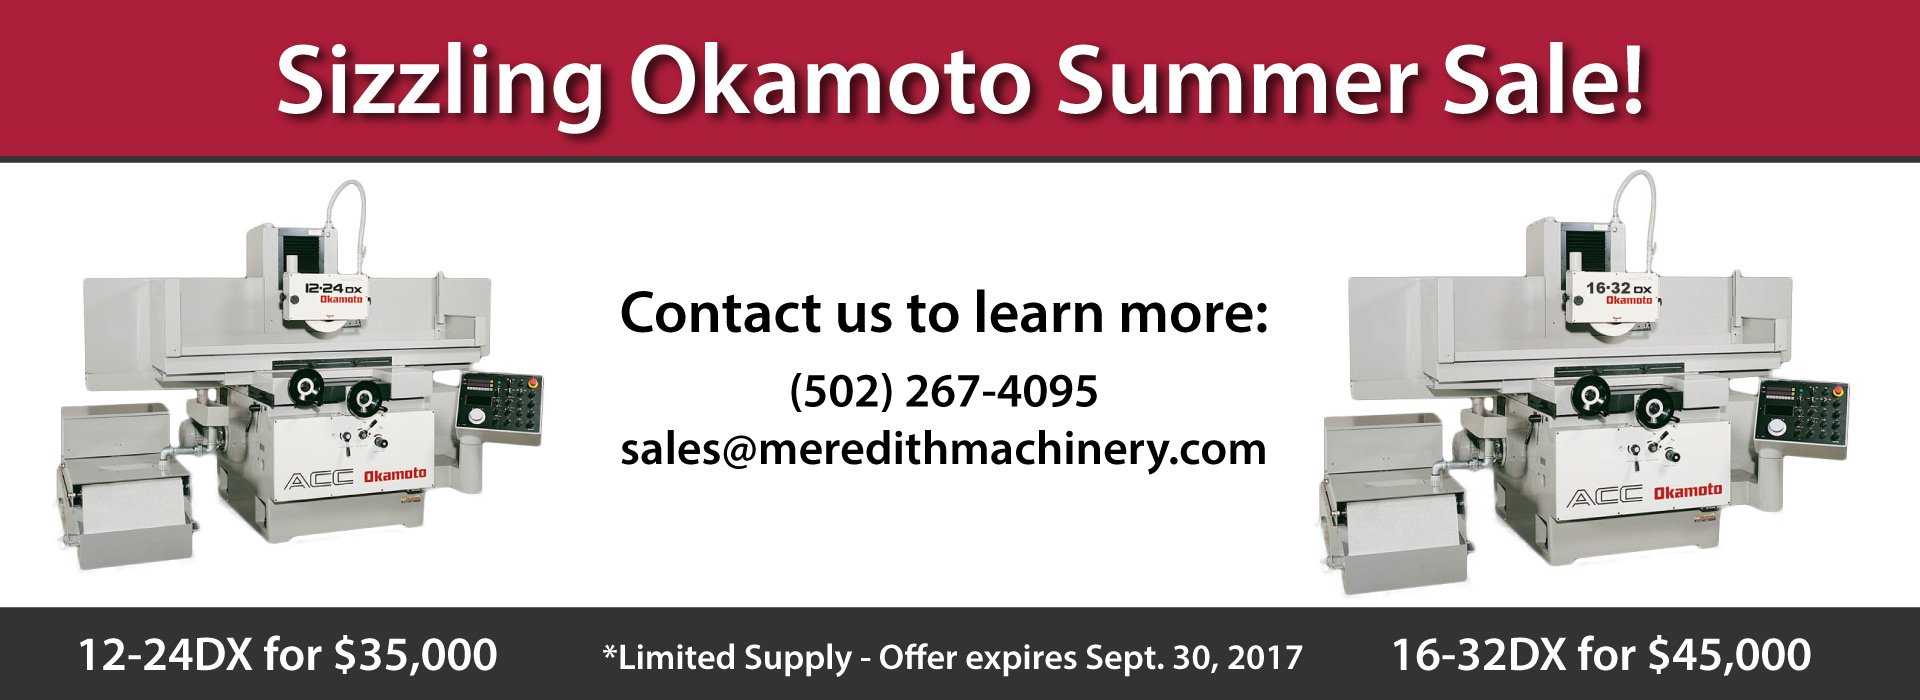 Okamoto-Summer-Sale